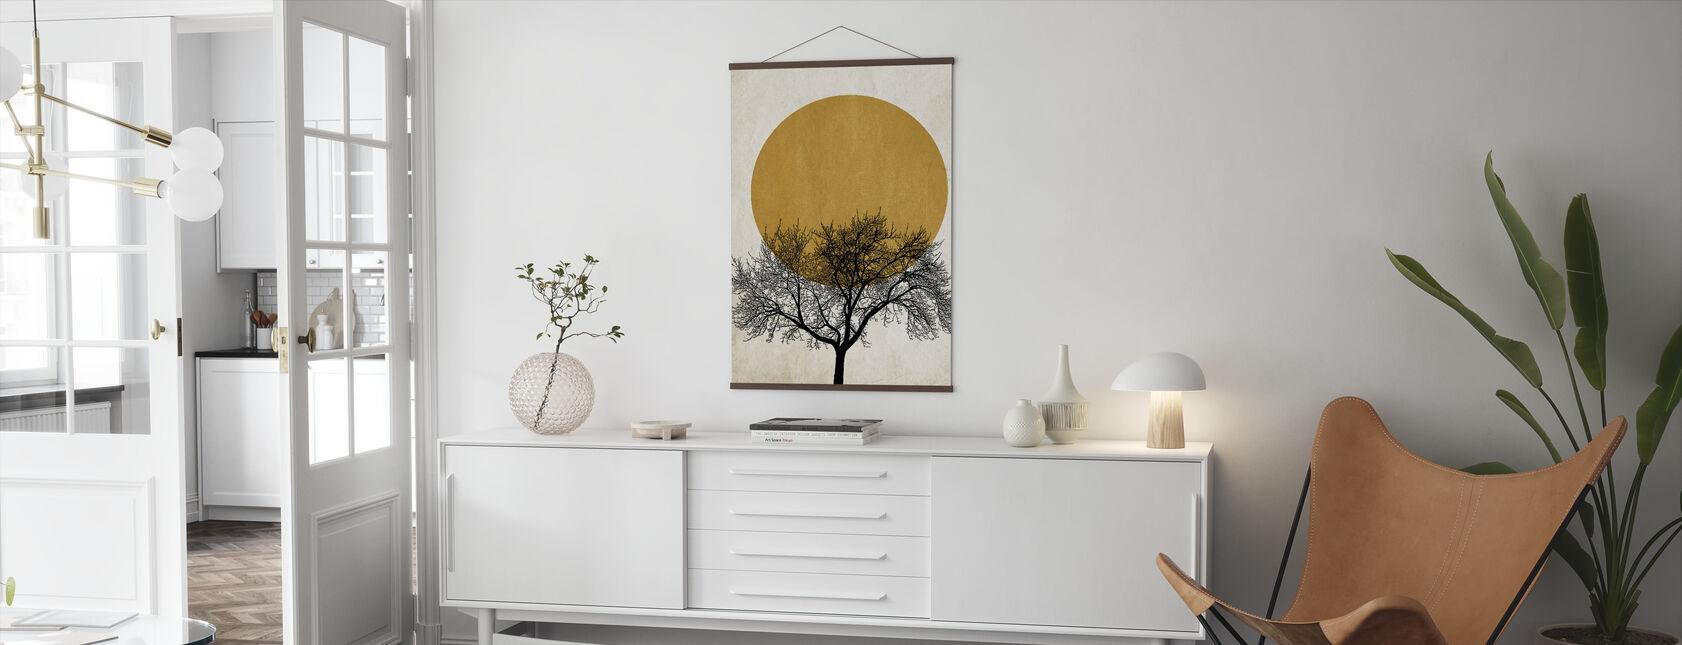 Winter Morning - Poster - Living Room